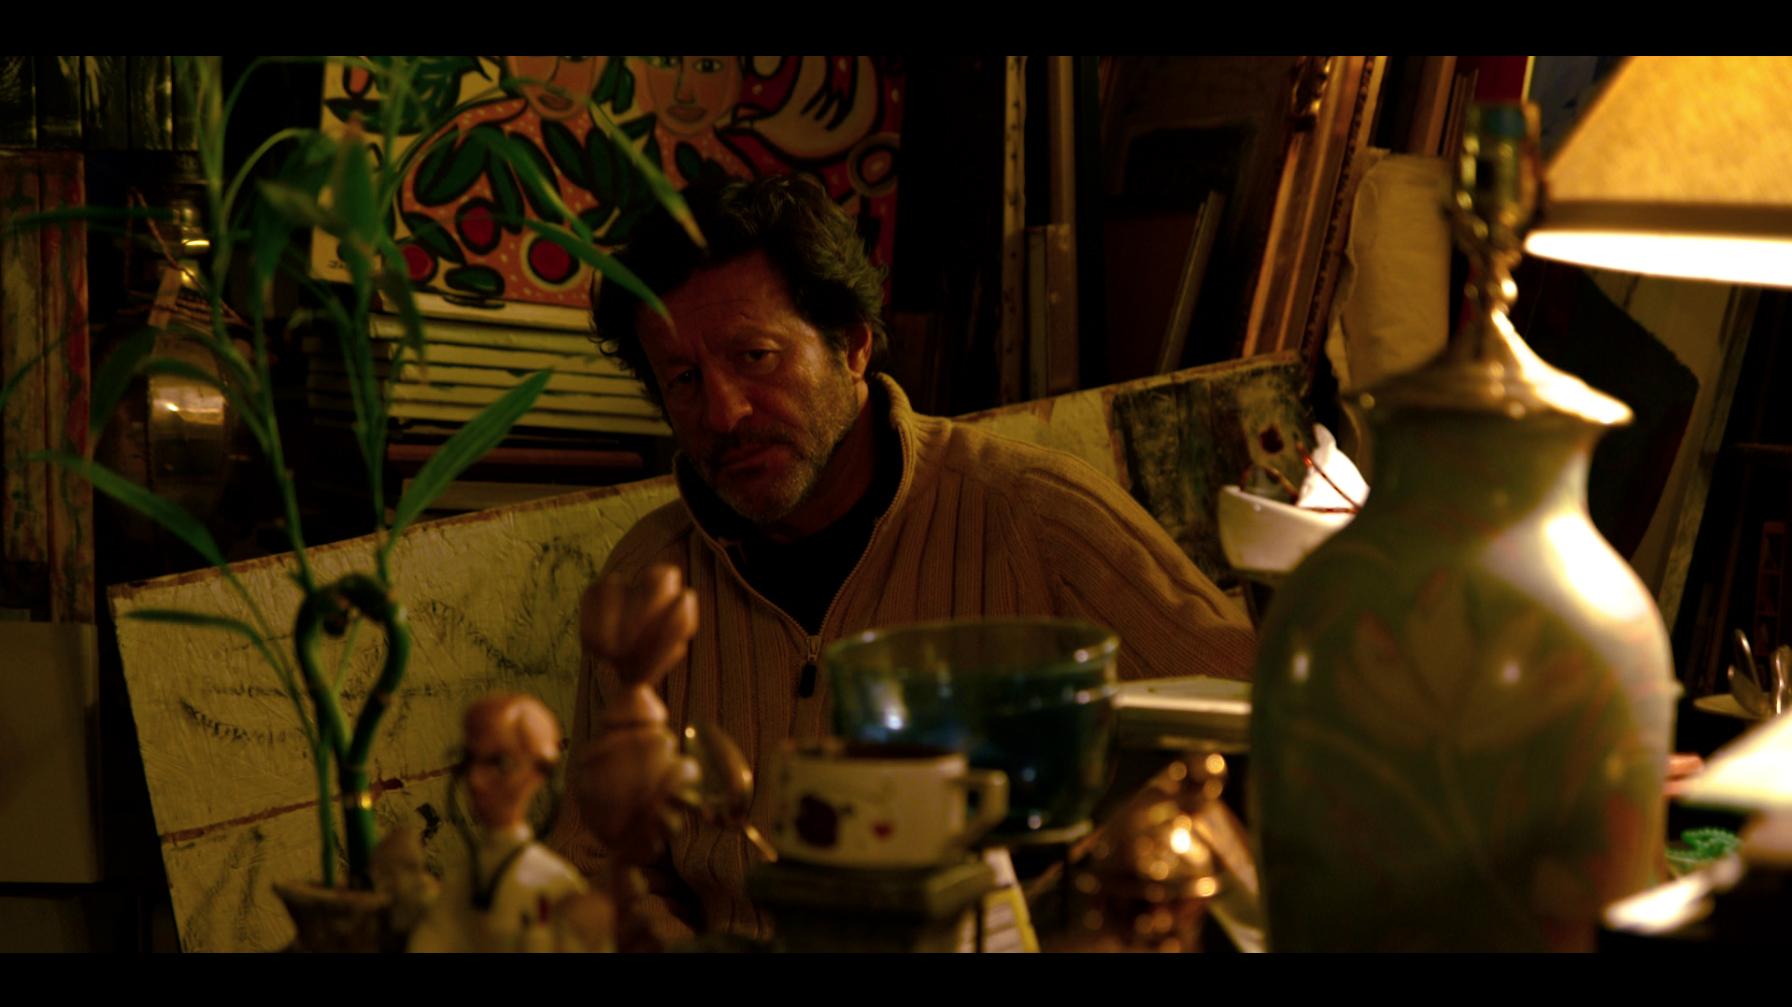 Joey the Junkman (Joaquim de Almeida) in his junk store. Still from the film.